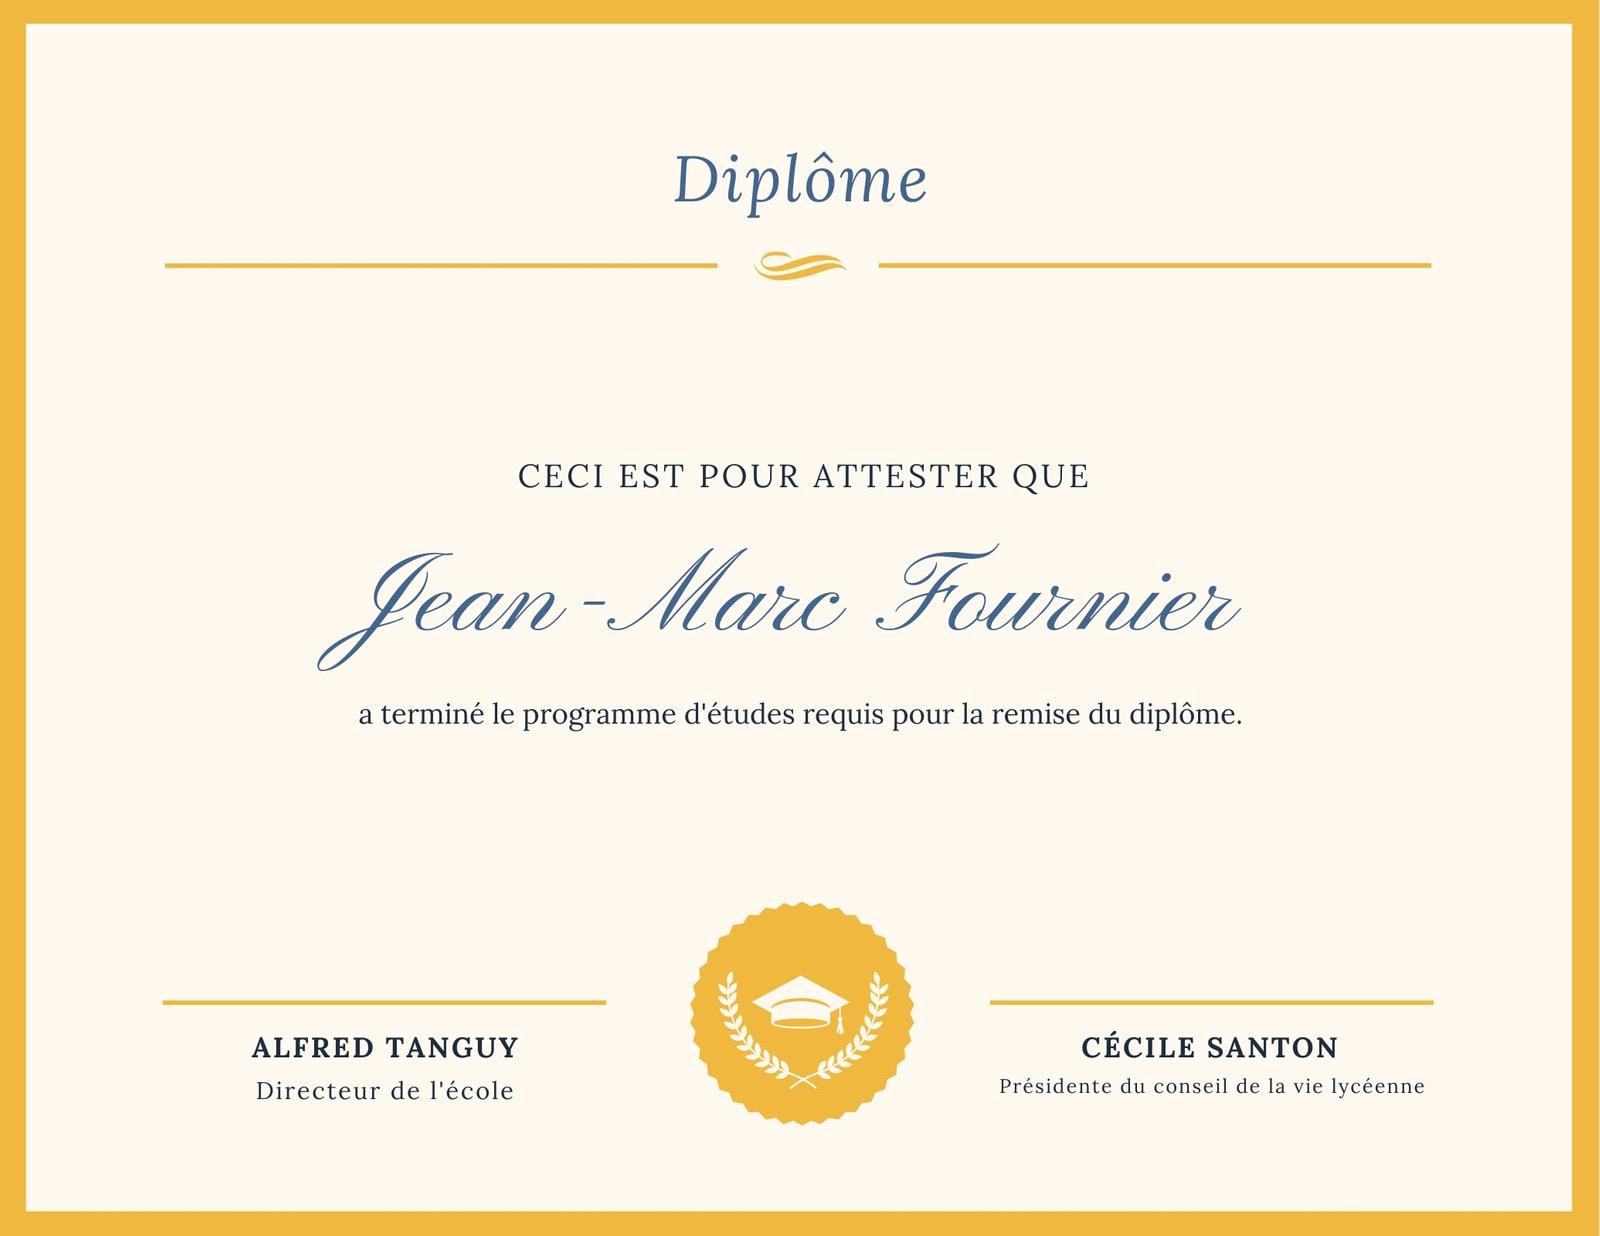 Exemple De Diplome Vierge